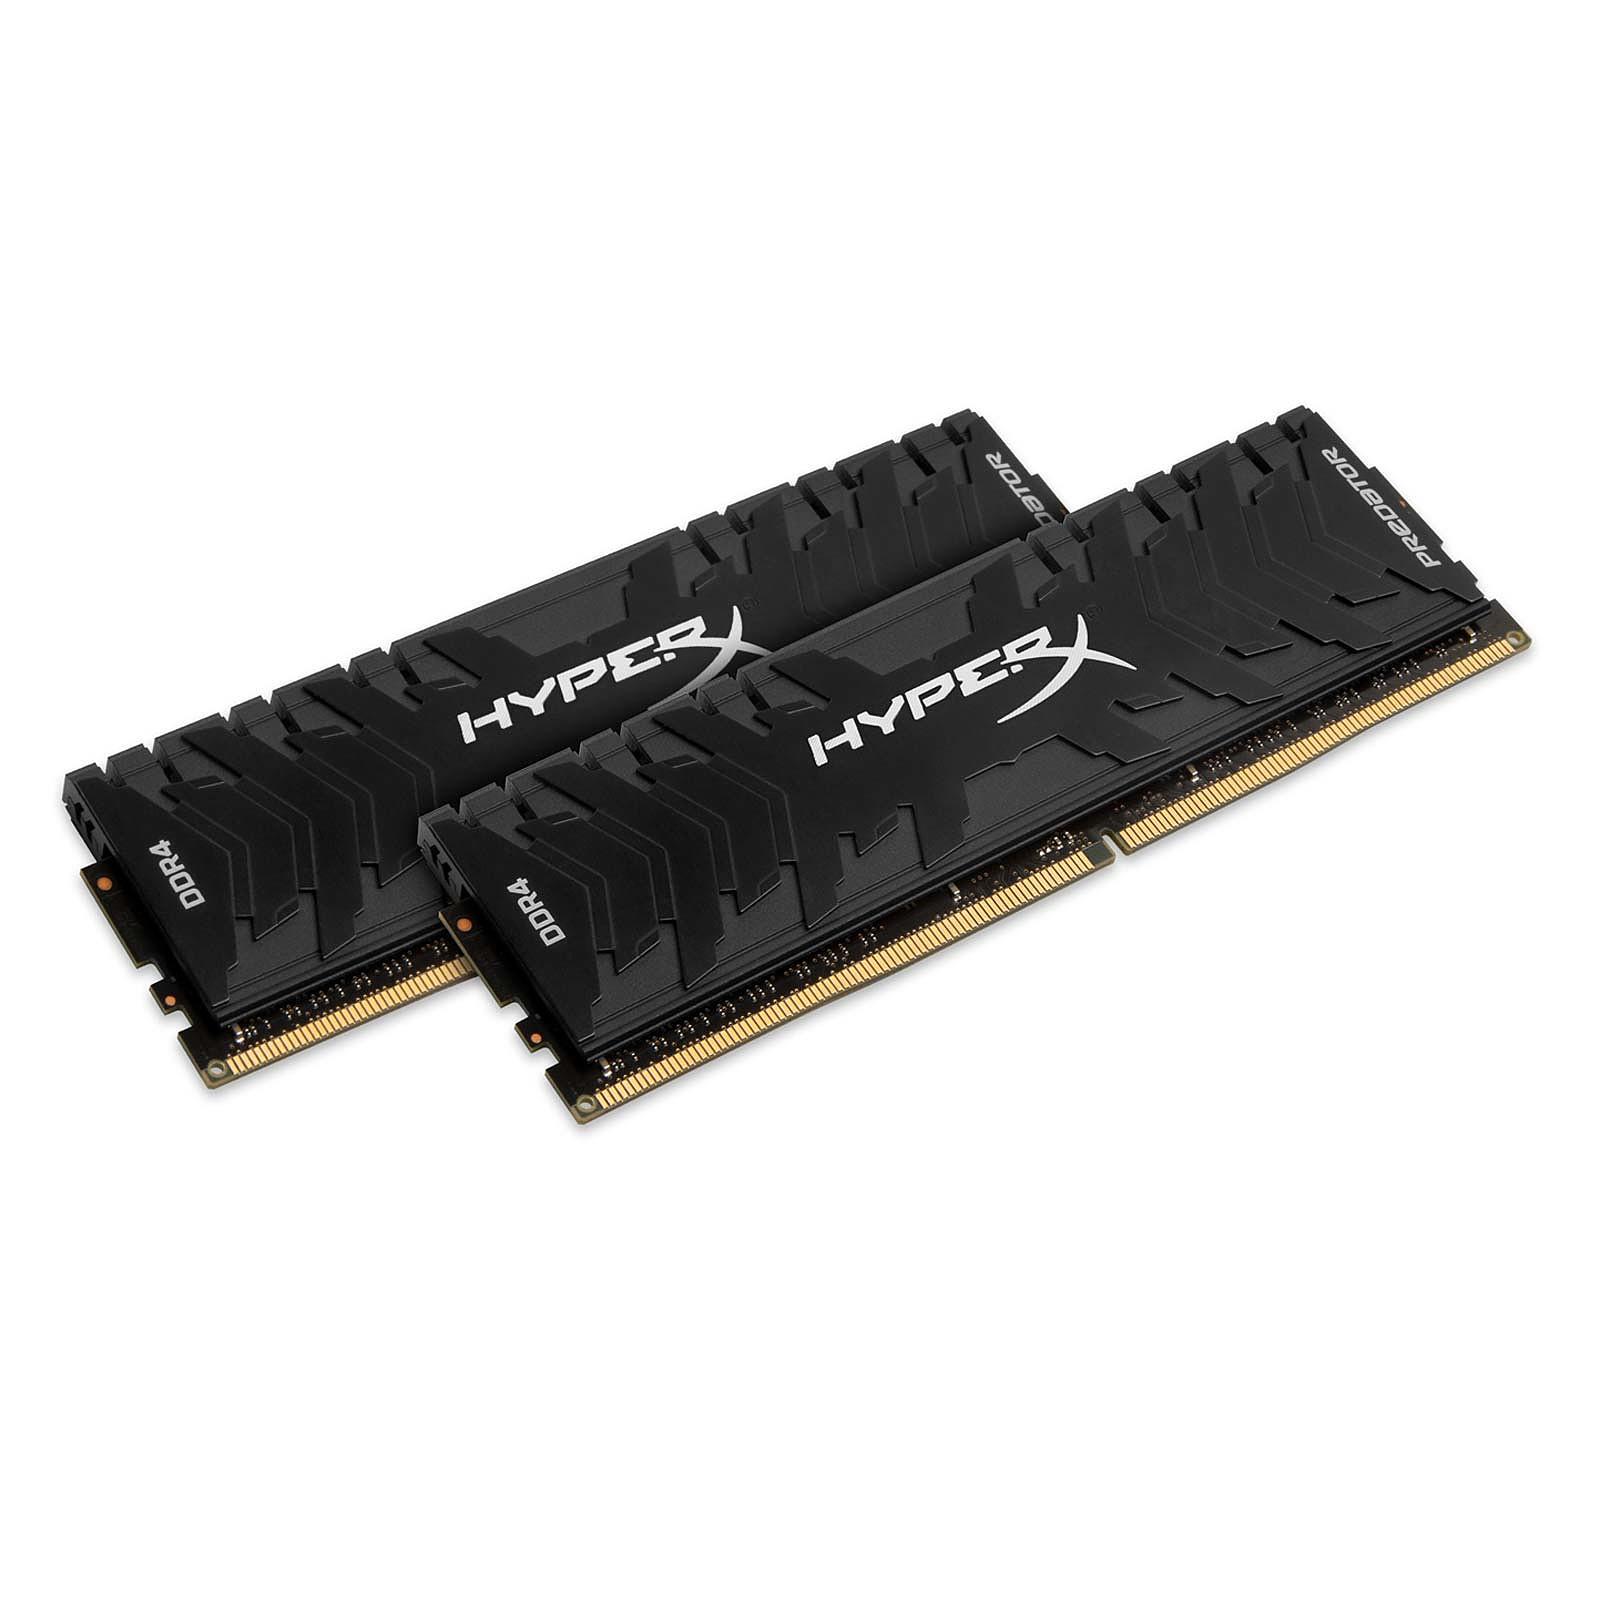 HyperX Predator Noir 32 Go (2x 16 Go) DDR4 2666 MHz CL13